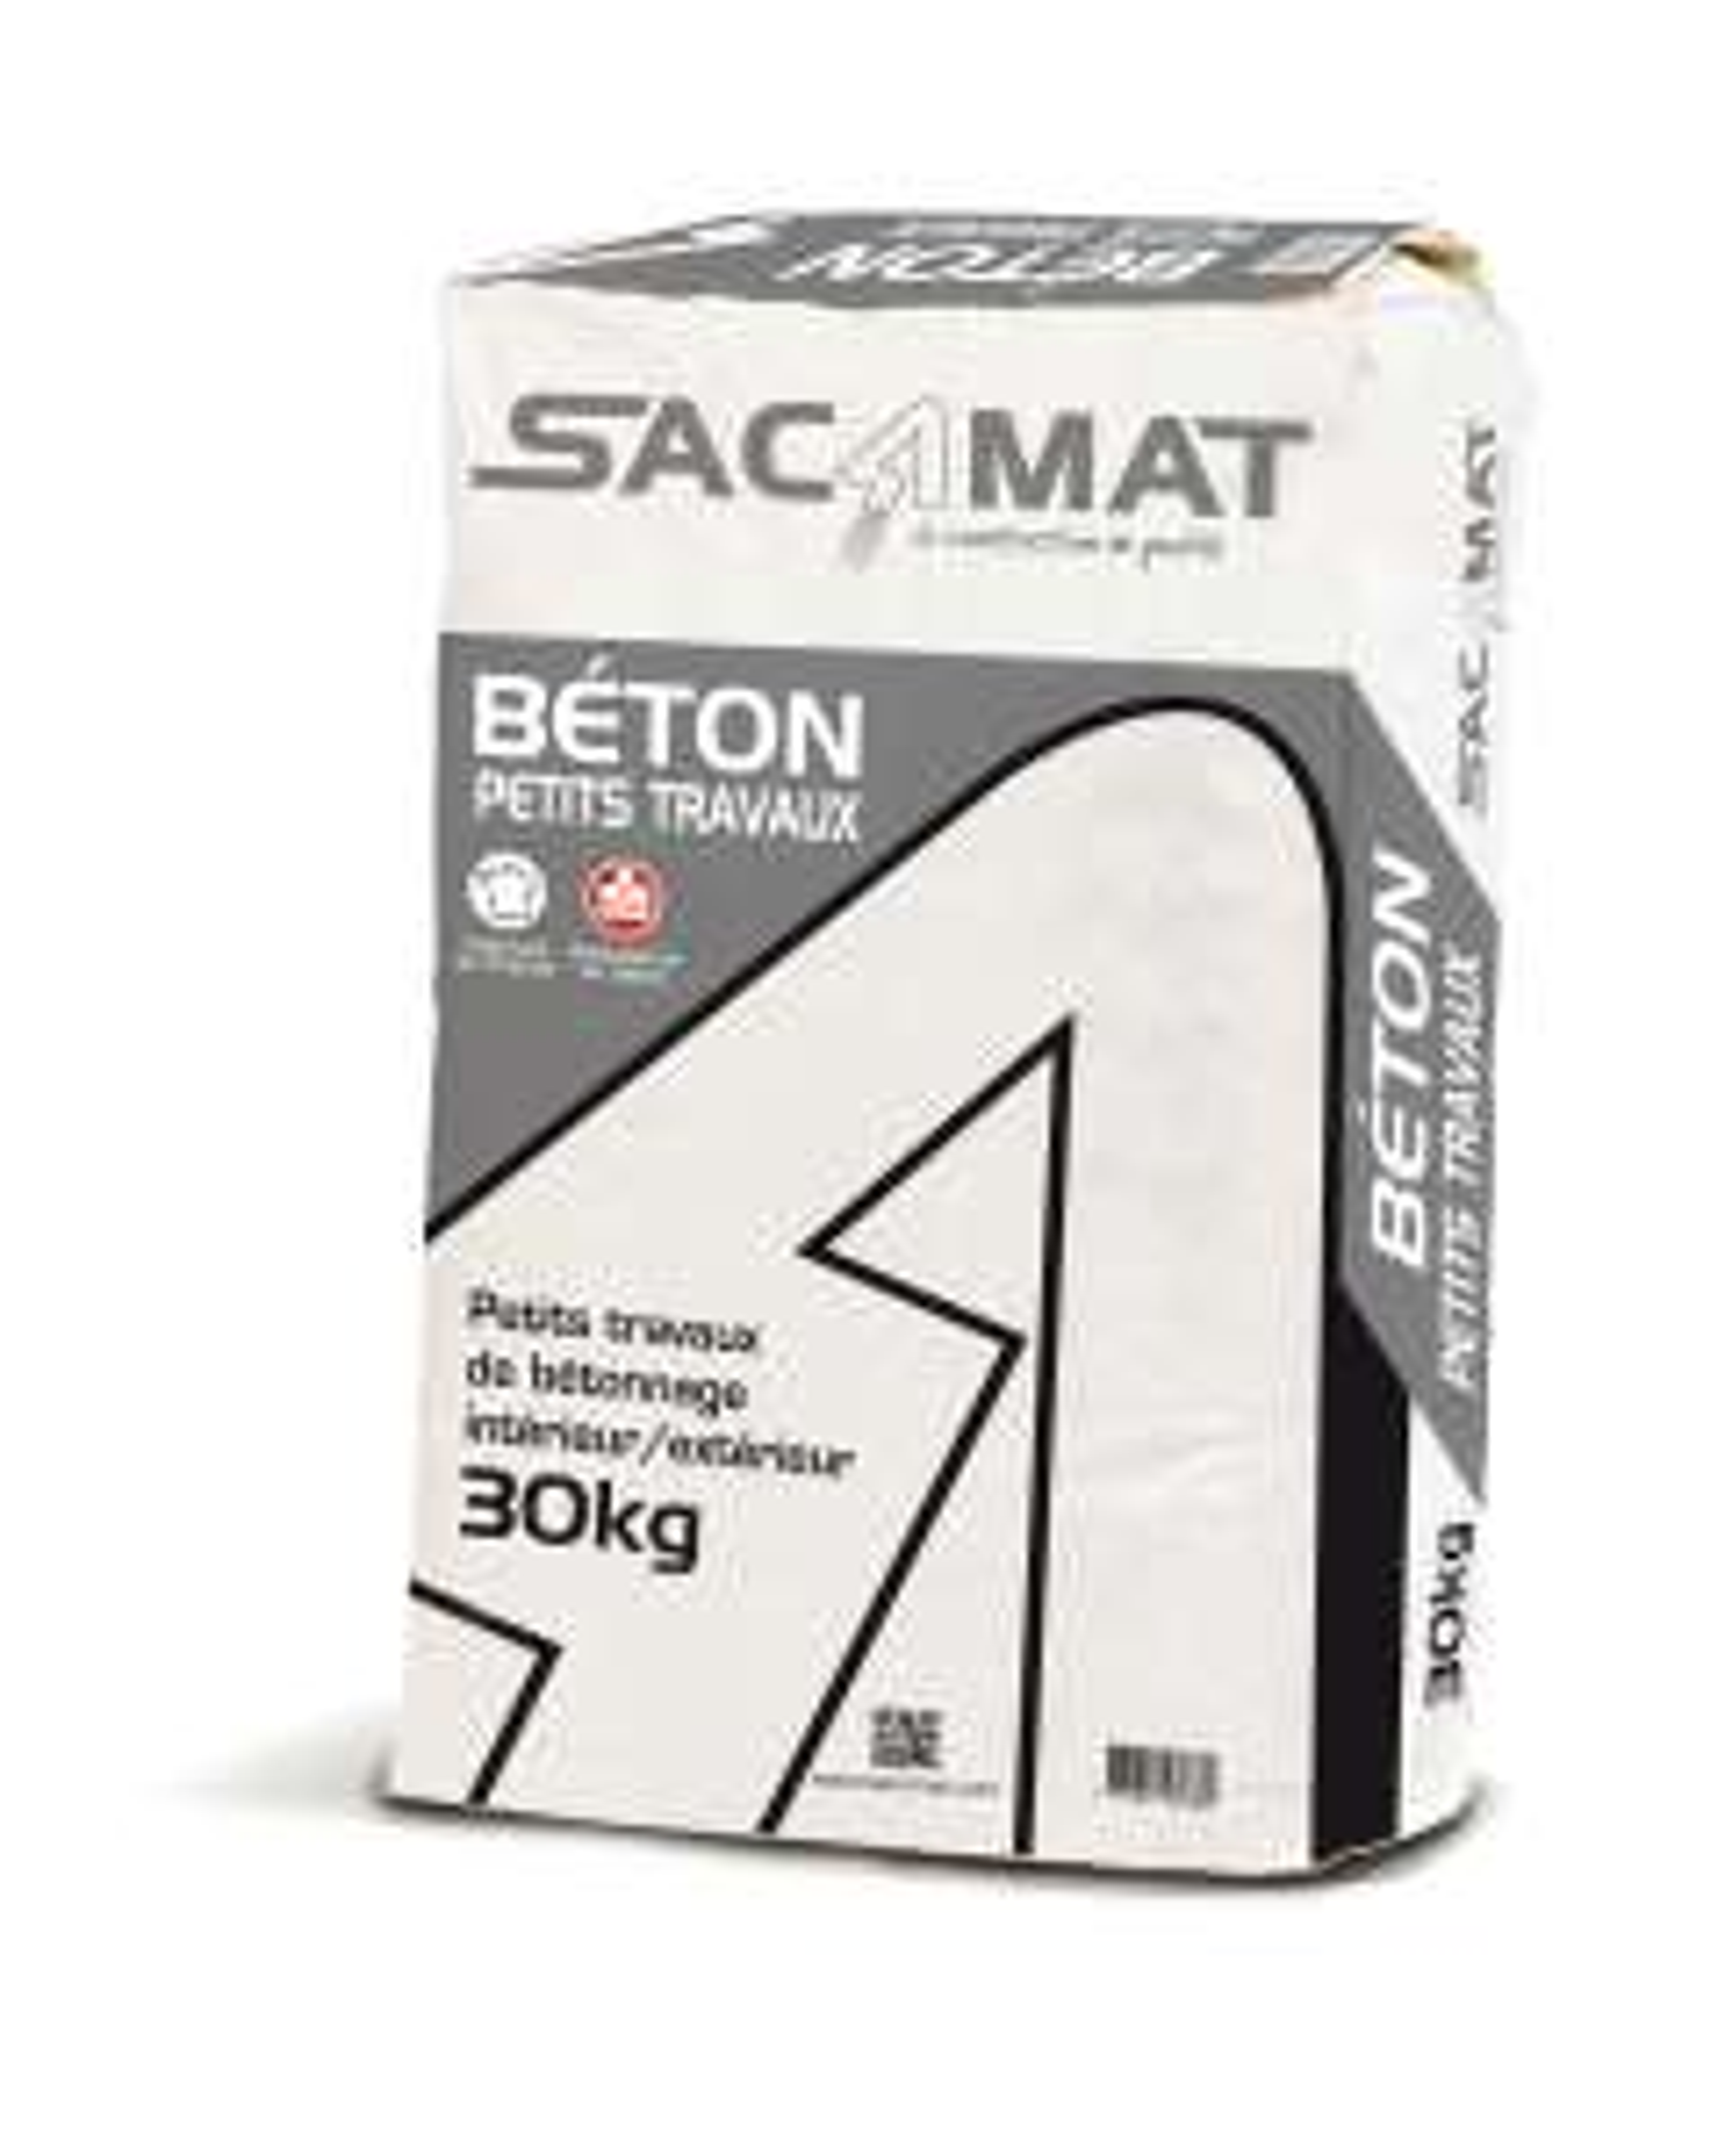 Béton prêt emploi Sacamat - 30 kg